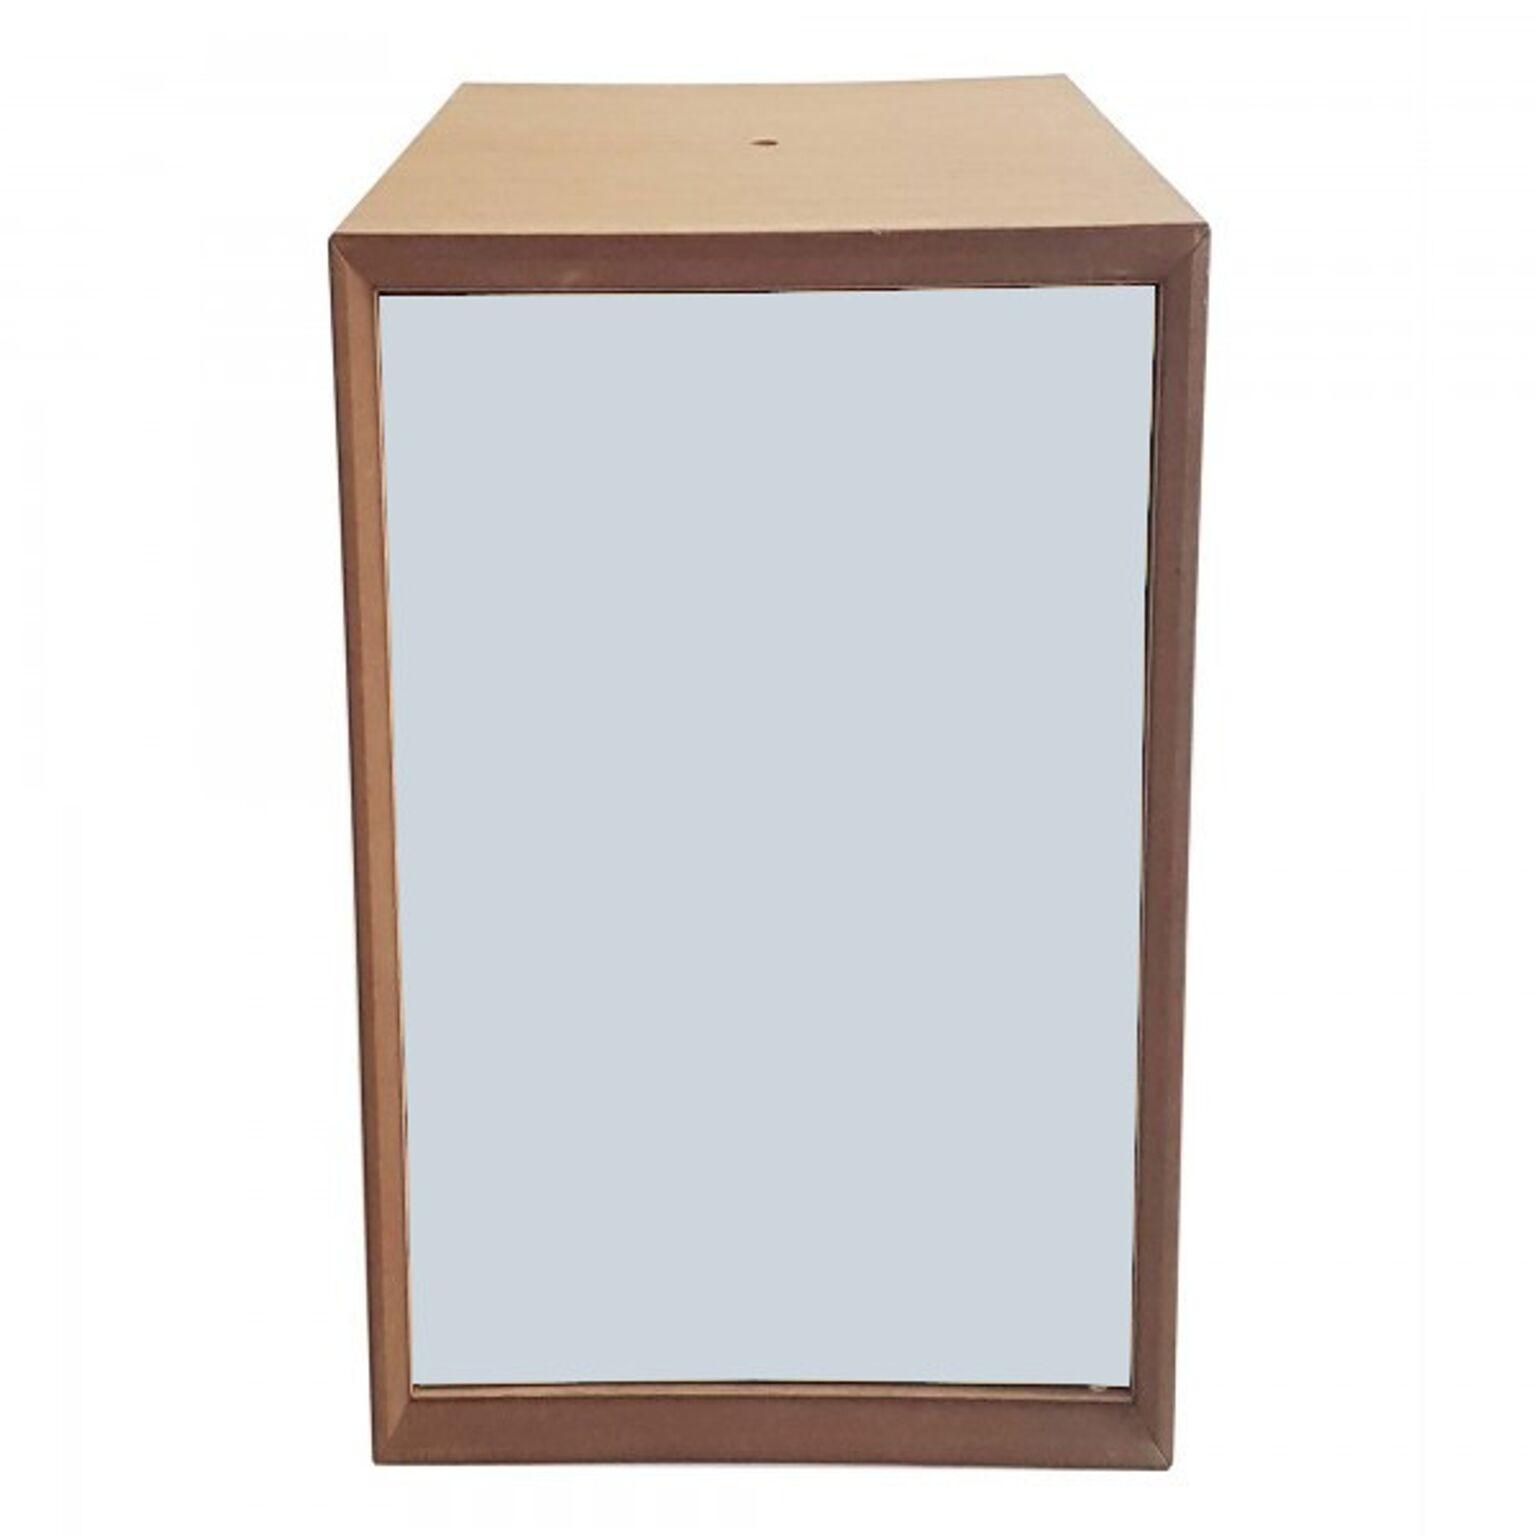 Dulap modular Pixel Light Grey / Wooden l40xA40xH80 cm